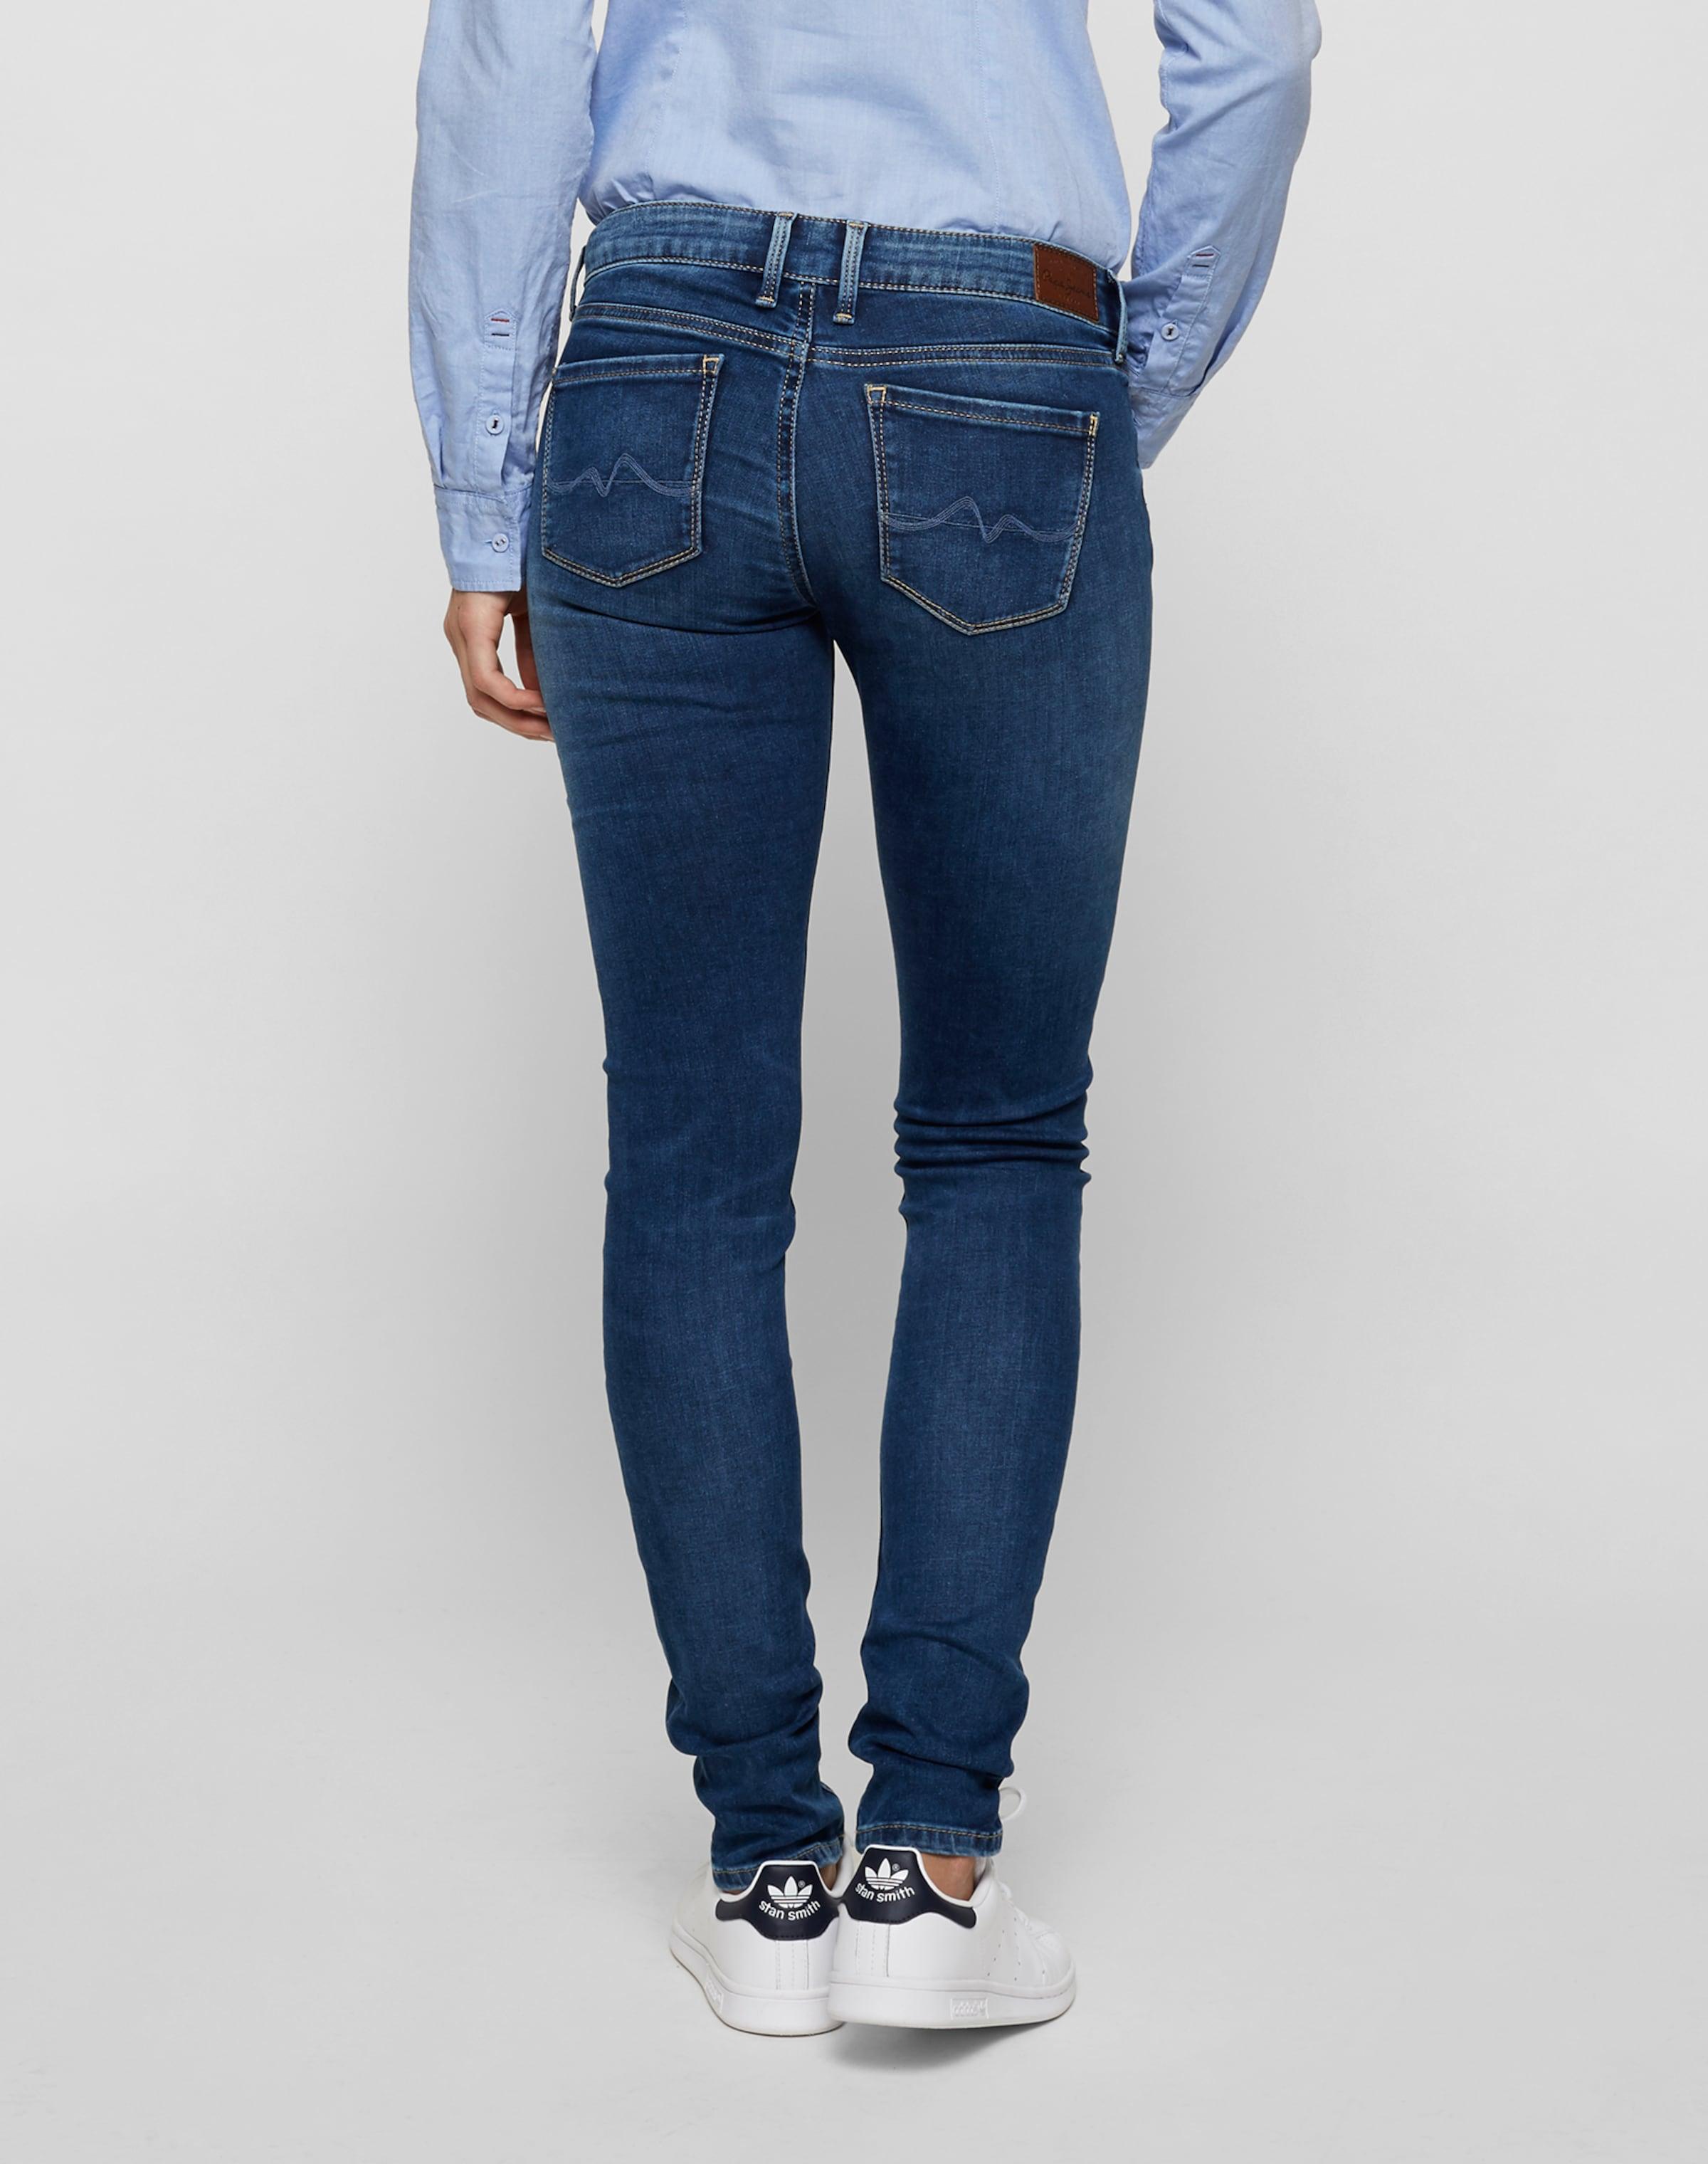 Bleu Jean Jeans 'soho' Pepe En Denim kXPOZiu